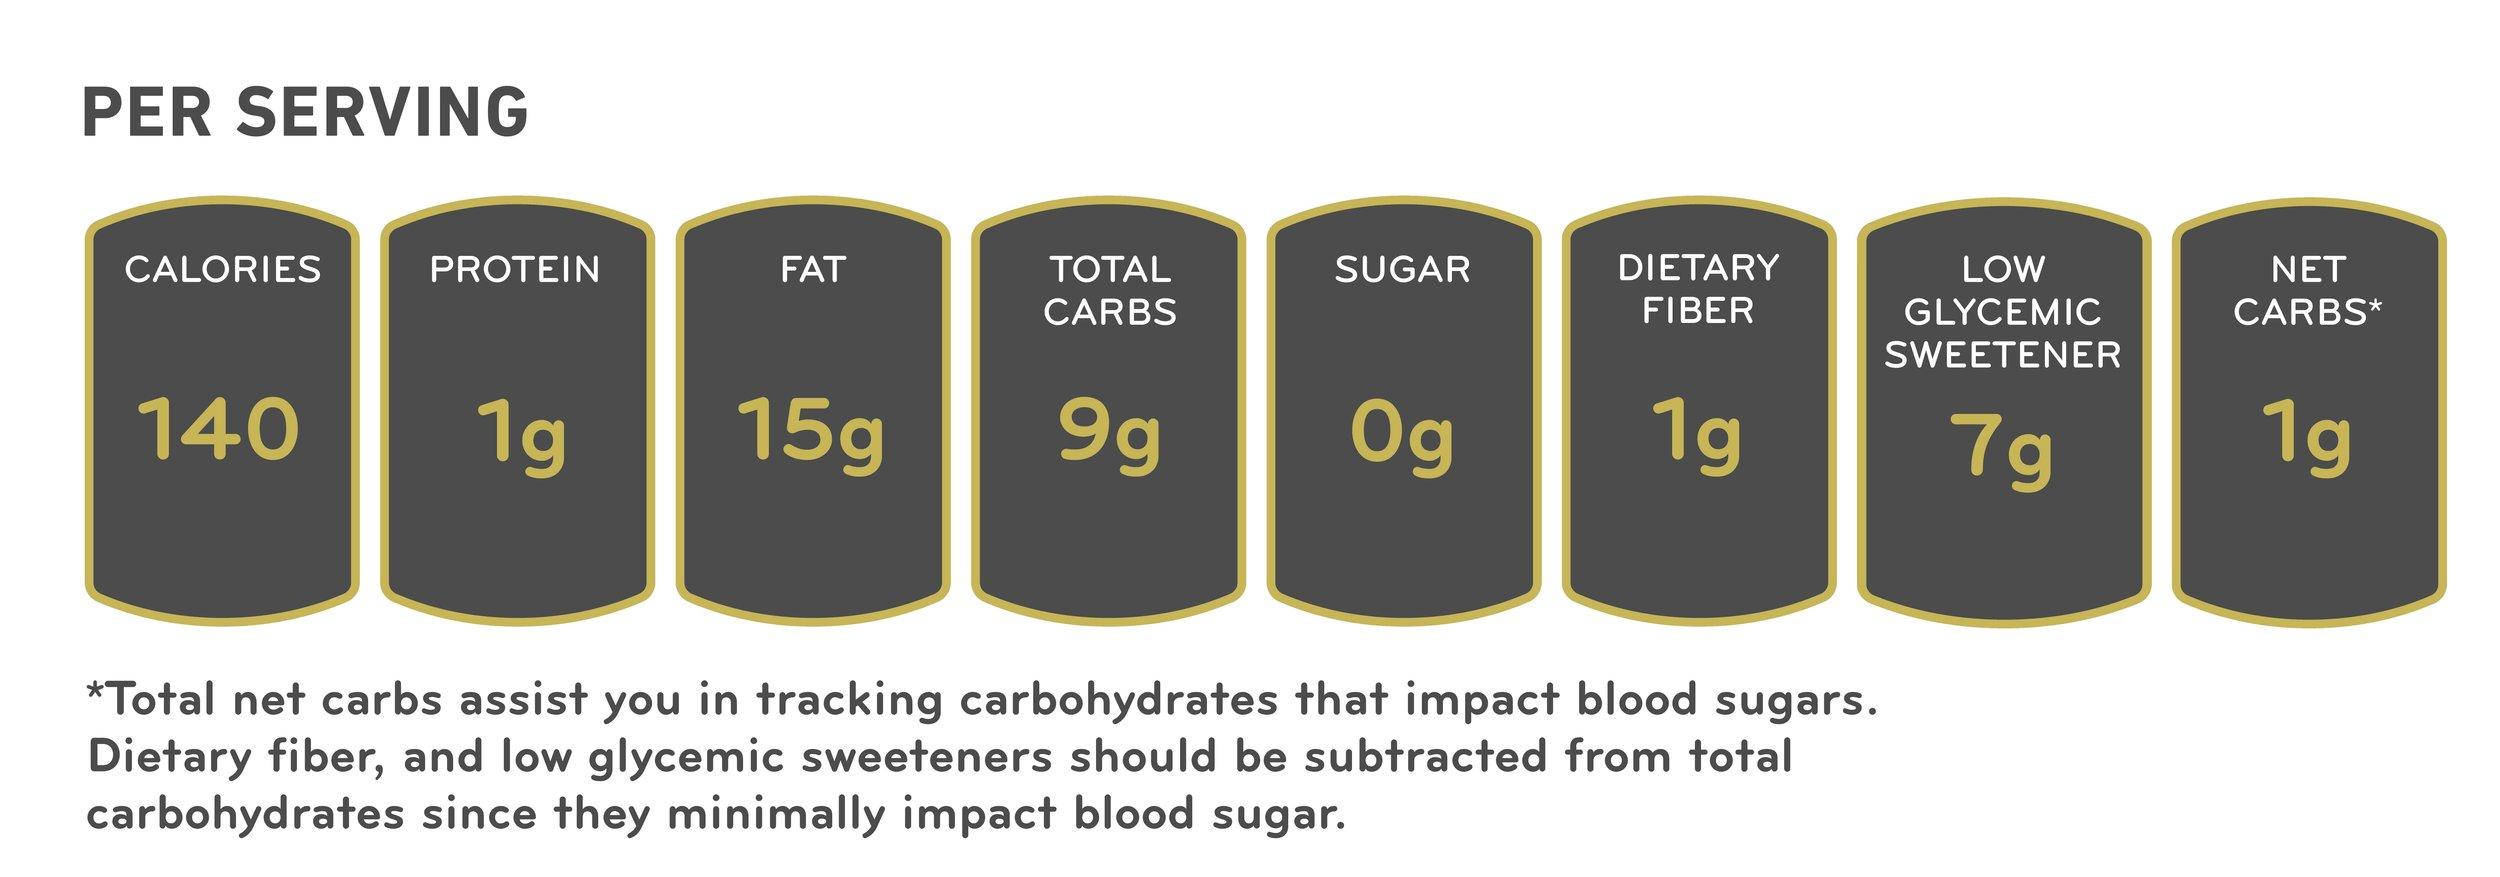 LOW CARB KETO CHOCOLATE LIQUEUR TRUFFLE SWEET TREAT RECIPE NUTRITION FACTS.jpg